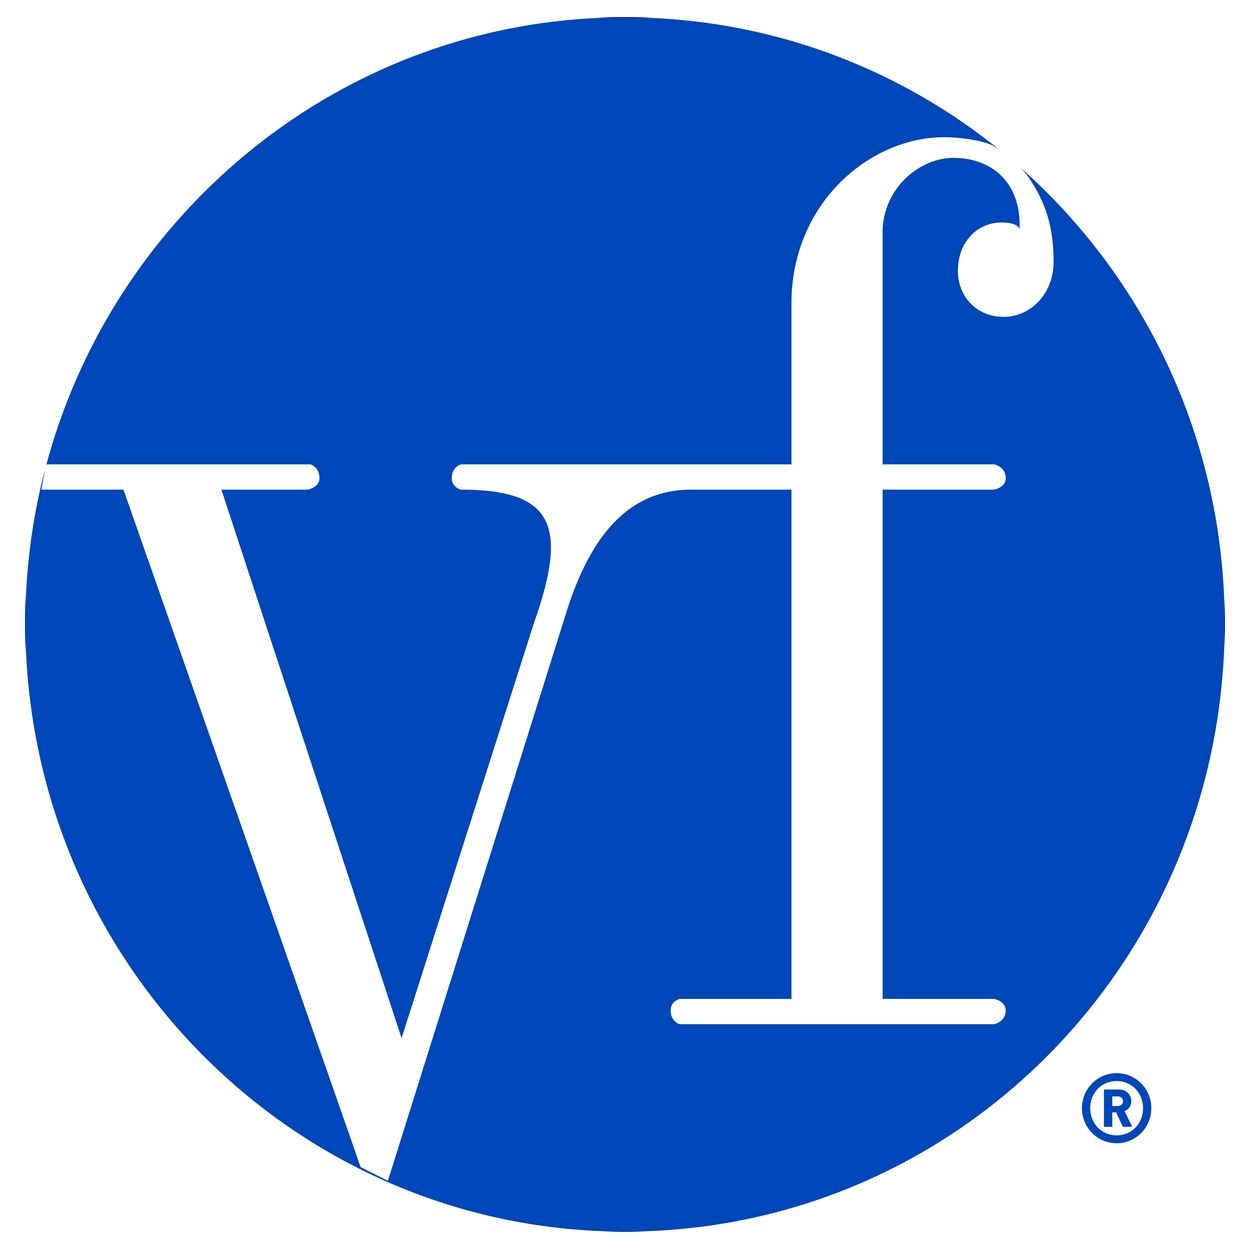 Vf Logo Tranformar Ropa Ropa